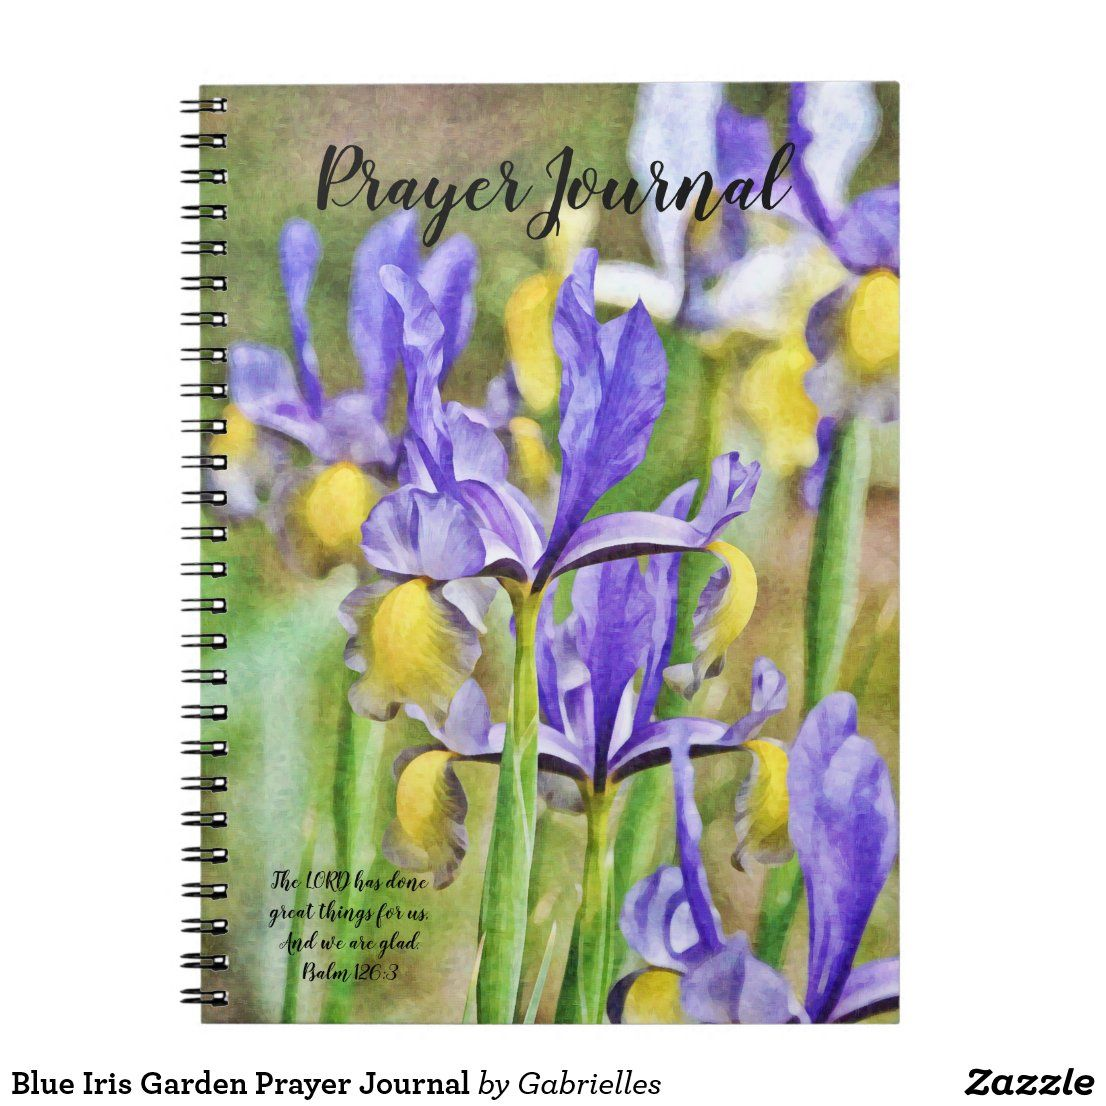 Blue Iris Garden Prayer Journal Zazzle Com In 2020 Iris Garden Prayer Journal Iris Flowers